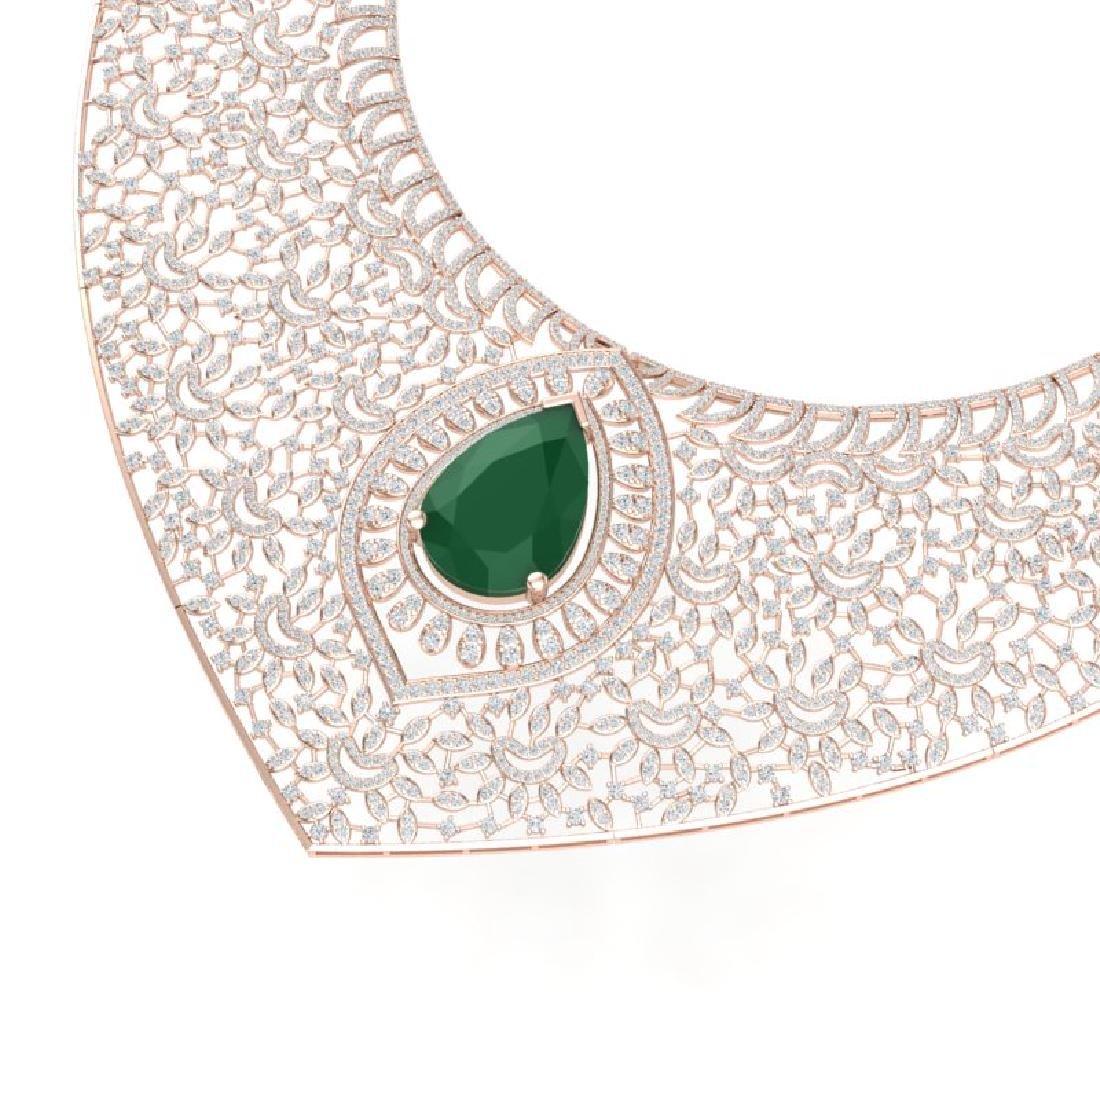 63.93 CTW Royalty Emerald & VS Diamond Necklace 18K